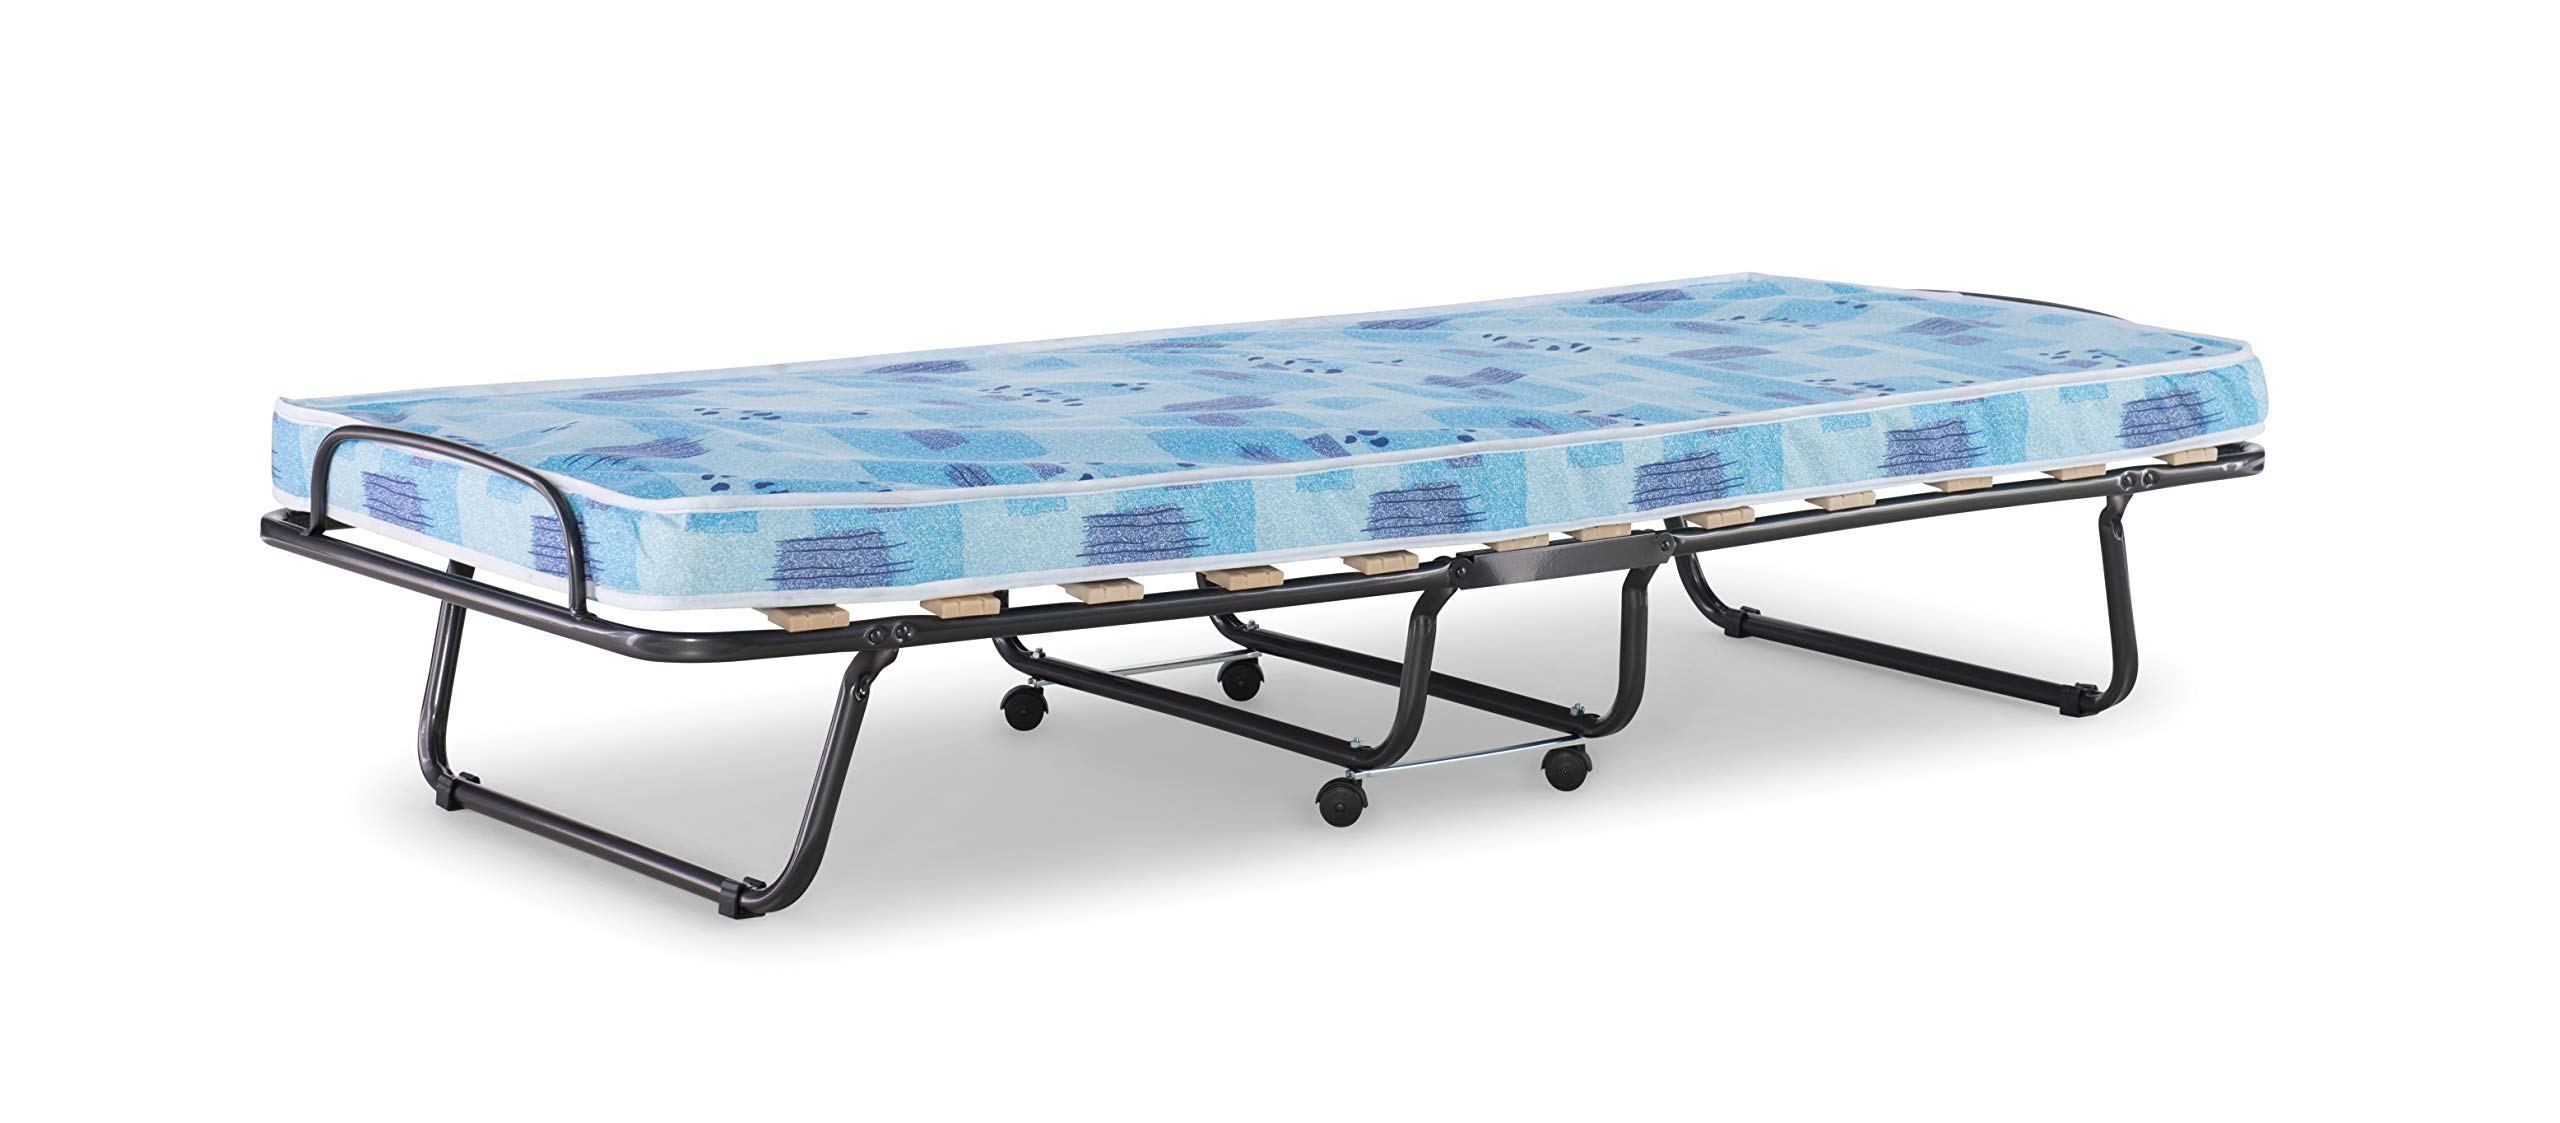 Linon 358ROMA-01-AS-U Folding Bed, Roma, Twin, Blue And White